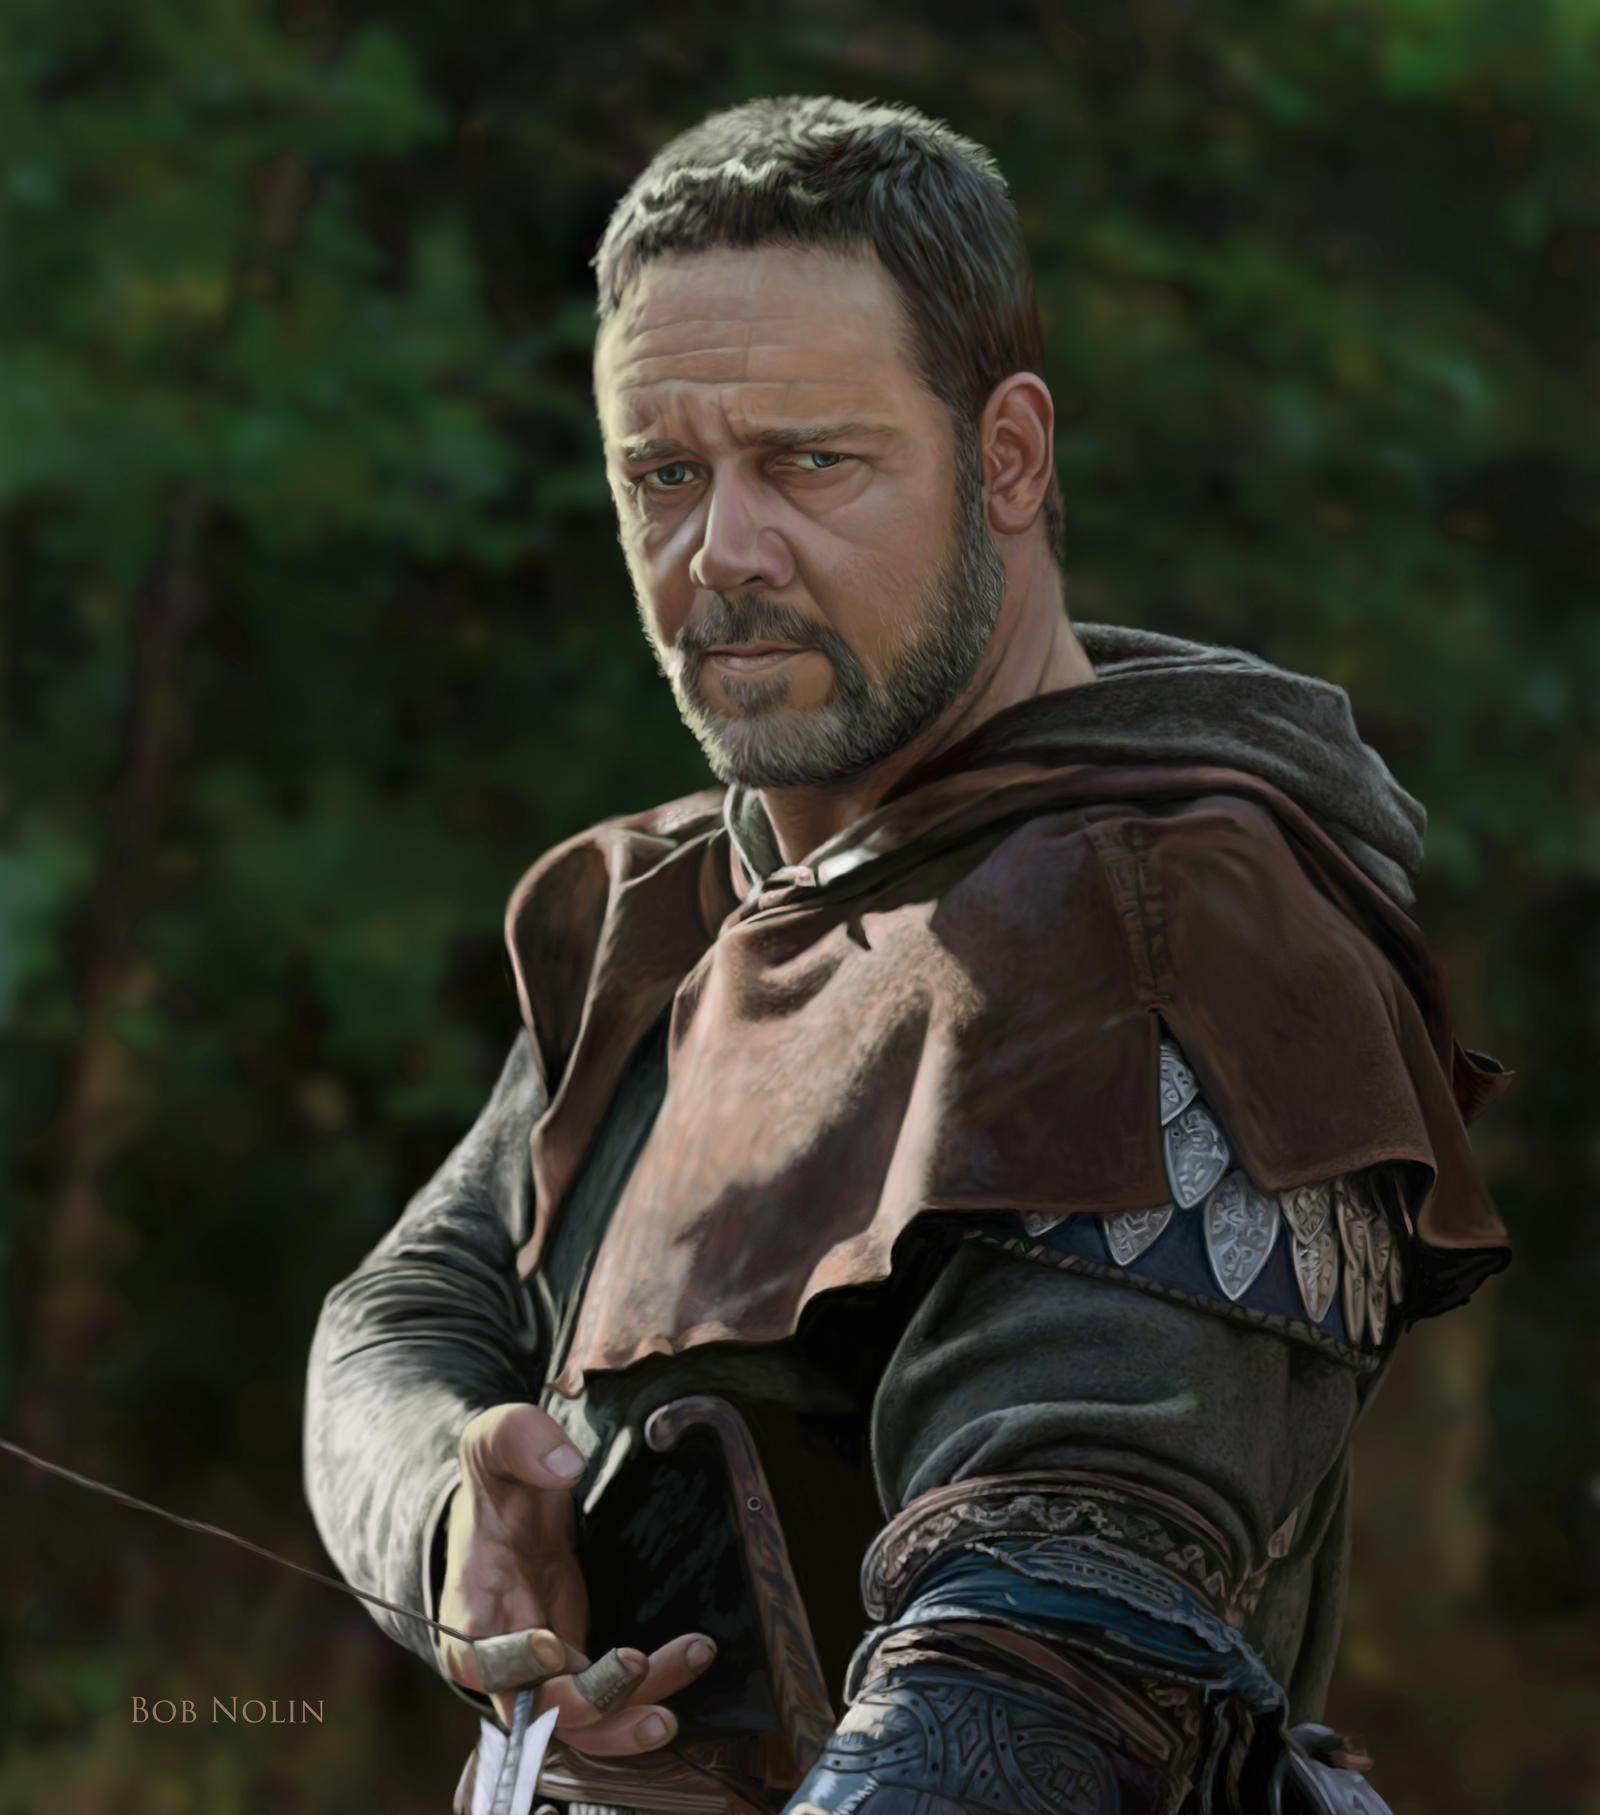 Russell Crowe as Robin Hood by bnolin on DeviantArt